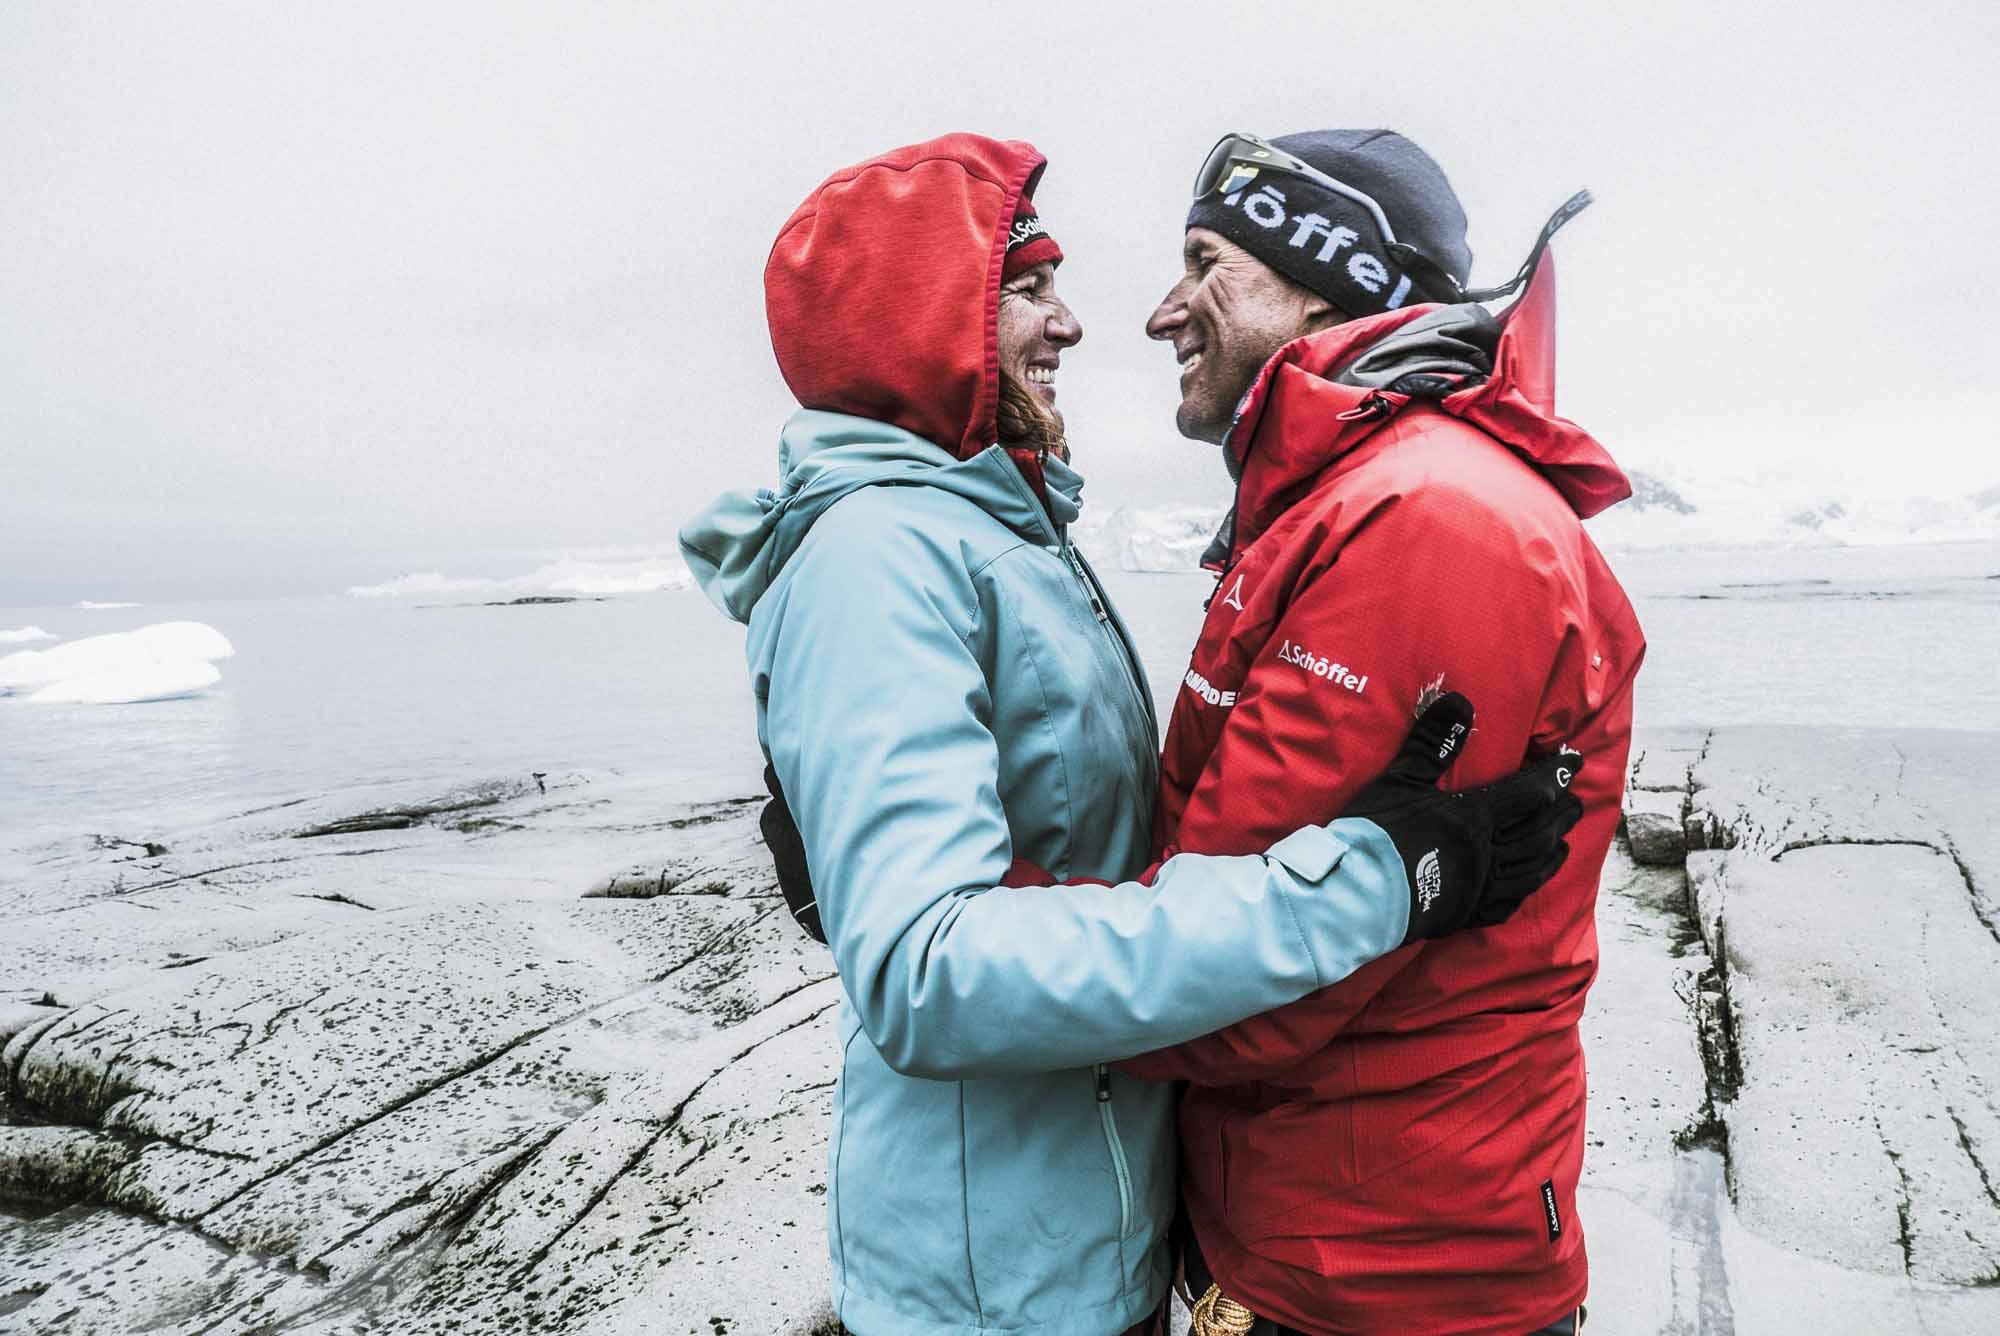 Polar-Quest-Exploration-Polaire-Exploring-Boundaries-in-Antarctica-Caroline-Cote-photo-Nancy-Hansen-Ralf-Dujmovits